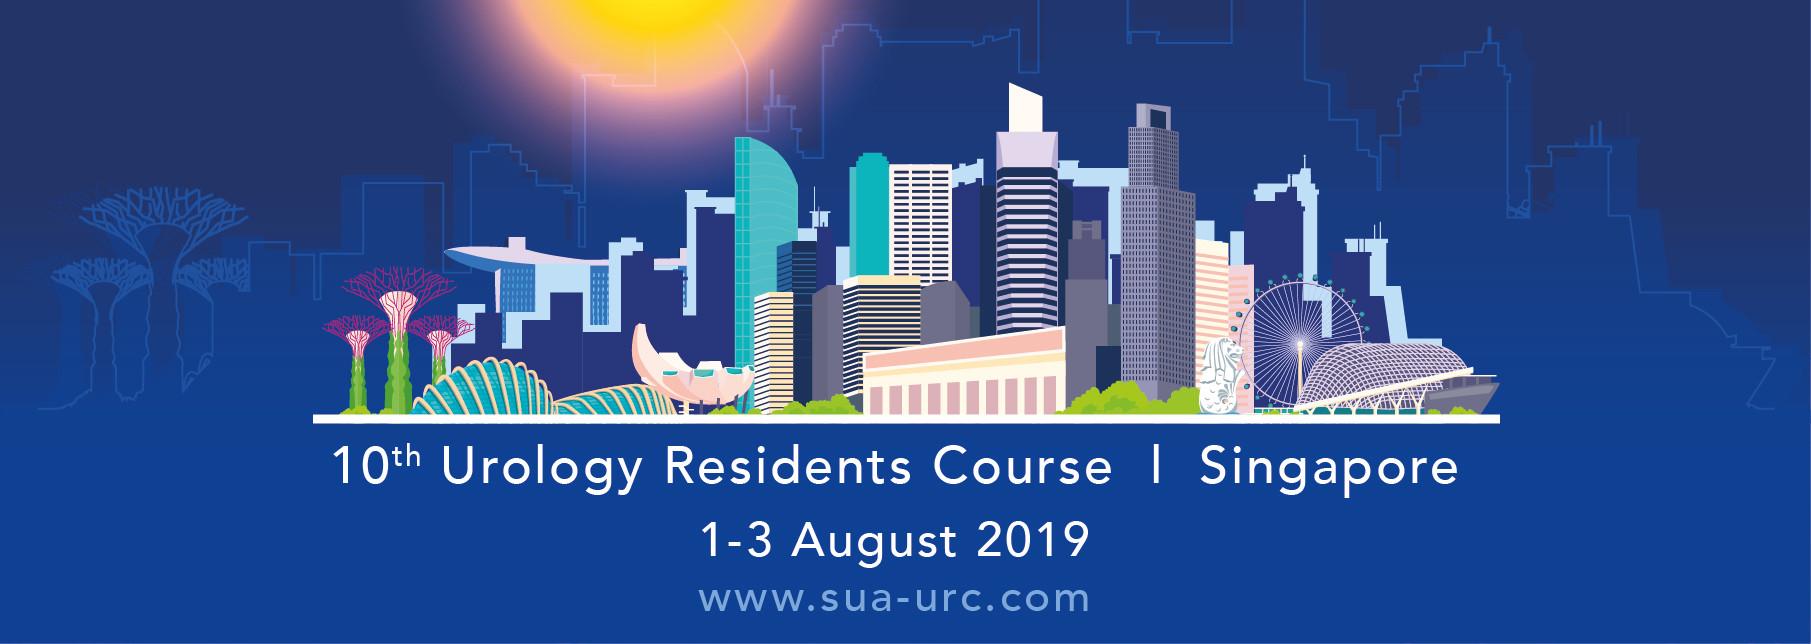 Urology Residents Course Singapore | Singapore Urological